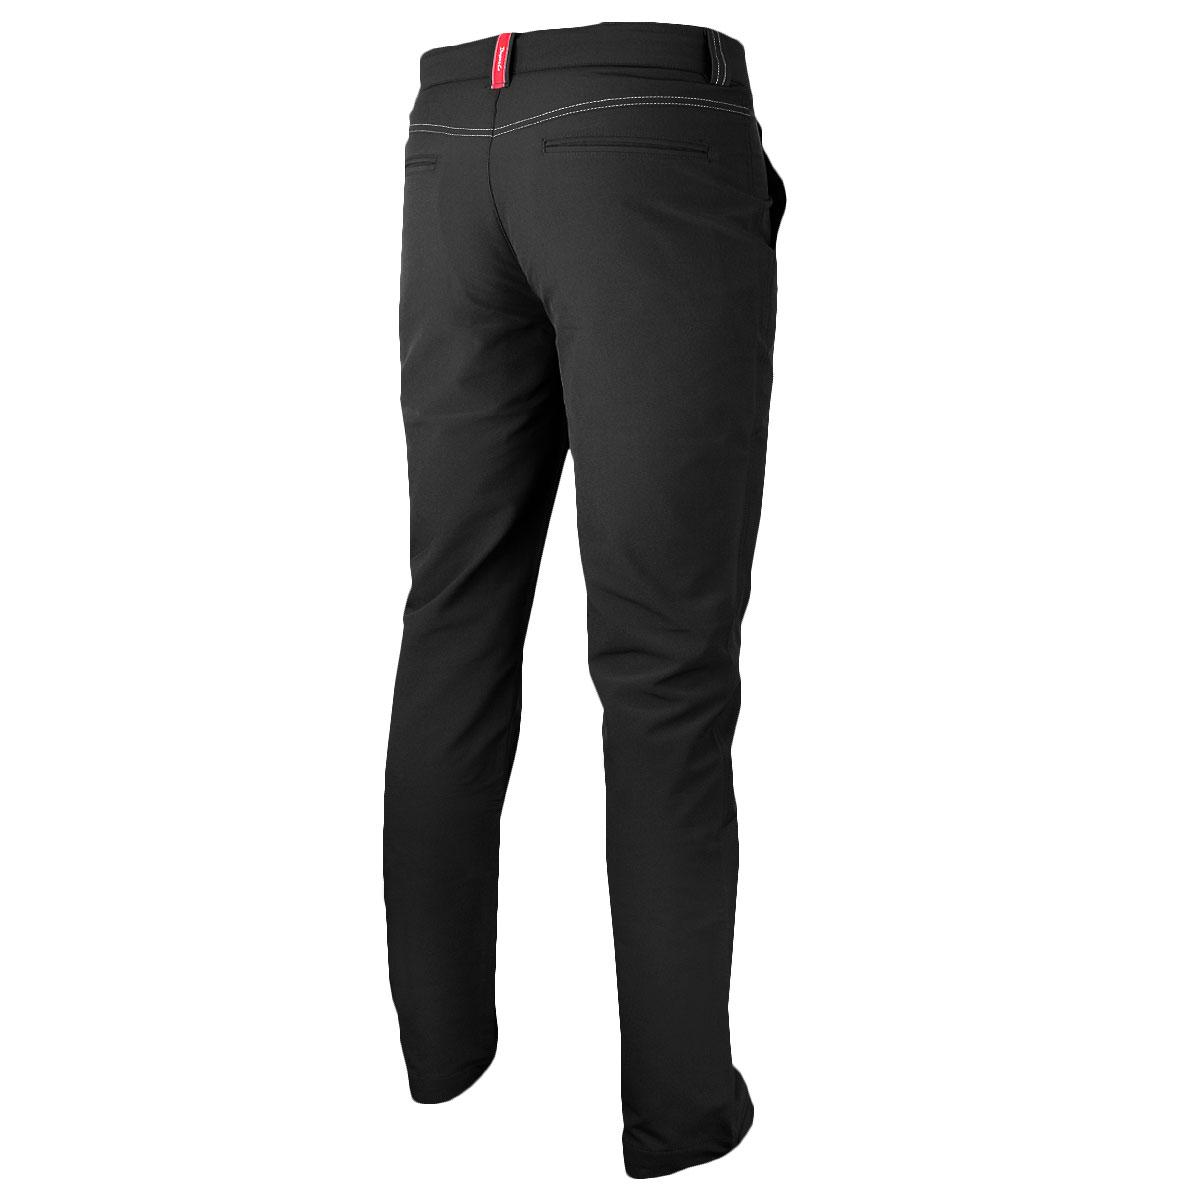 Dwyers-amp-Co-Mens-Golf-Trousers-Micro-Tech-Pant-43-OFF-RRP thumbnail 3